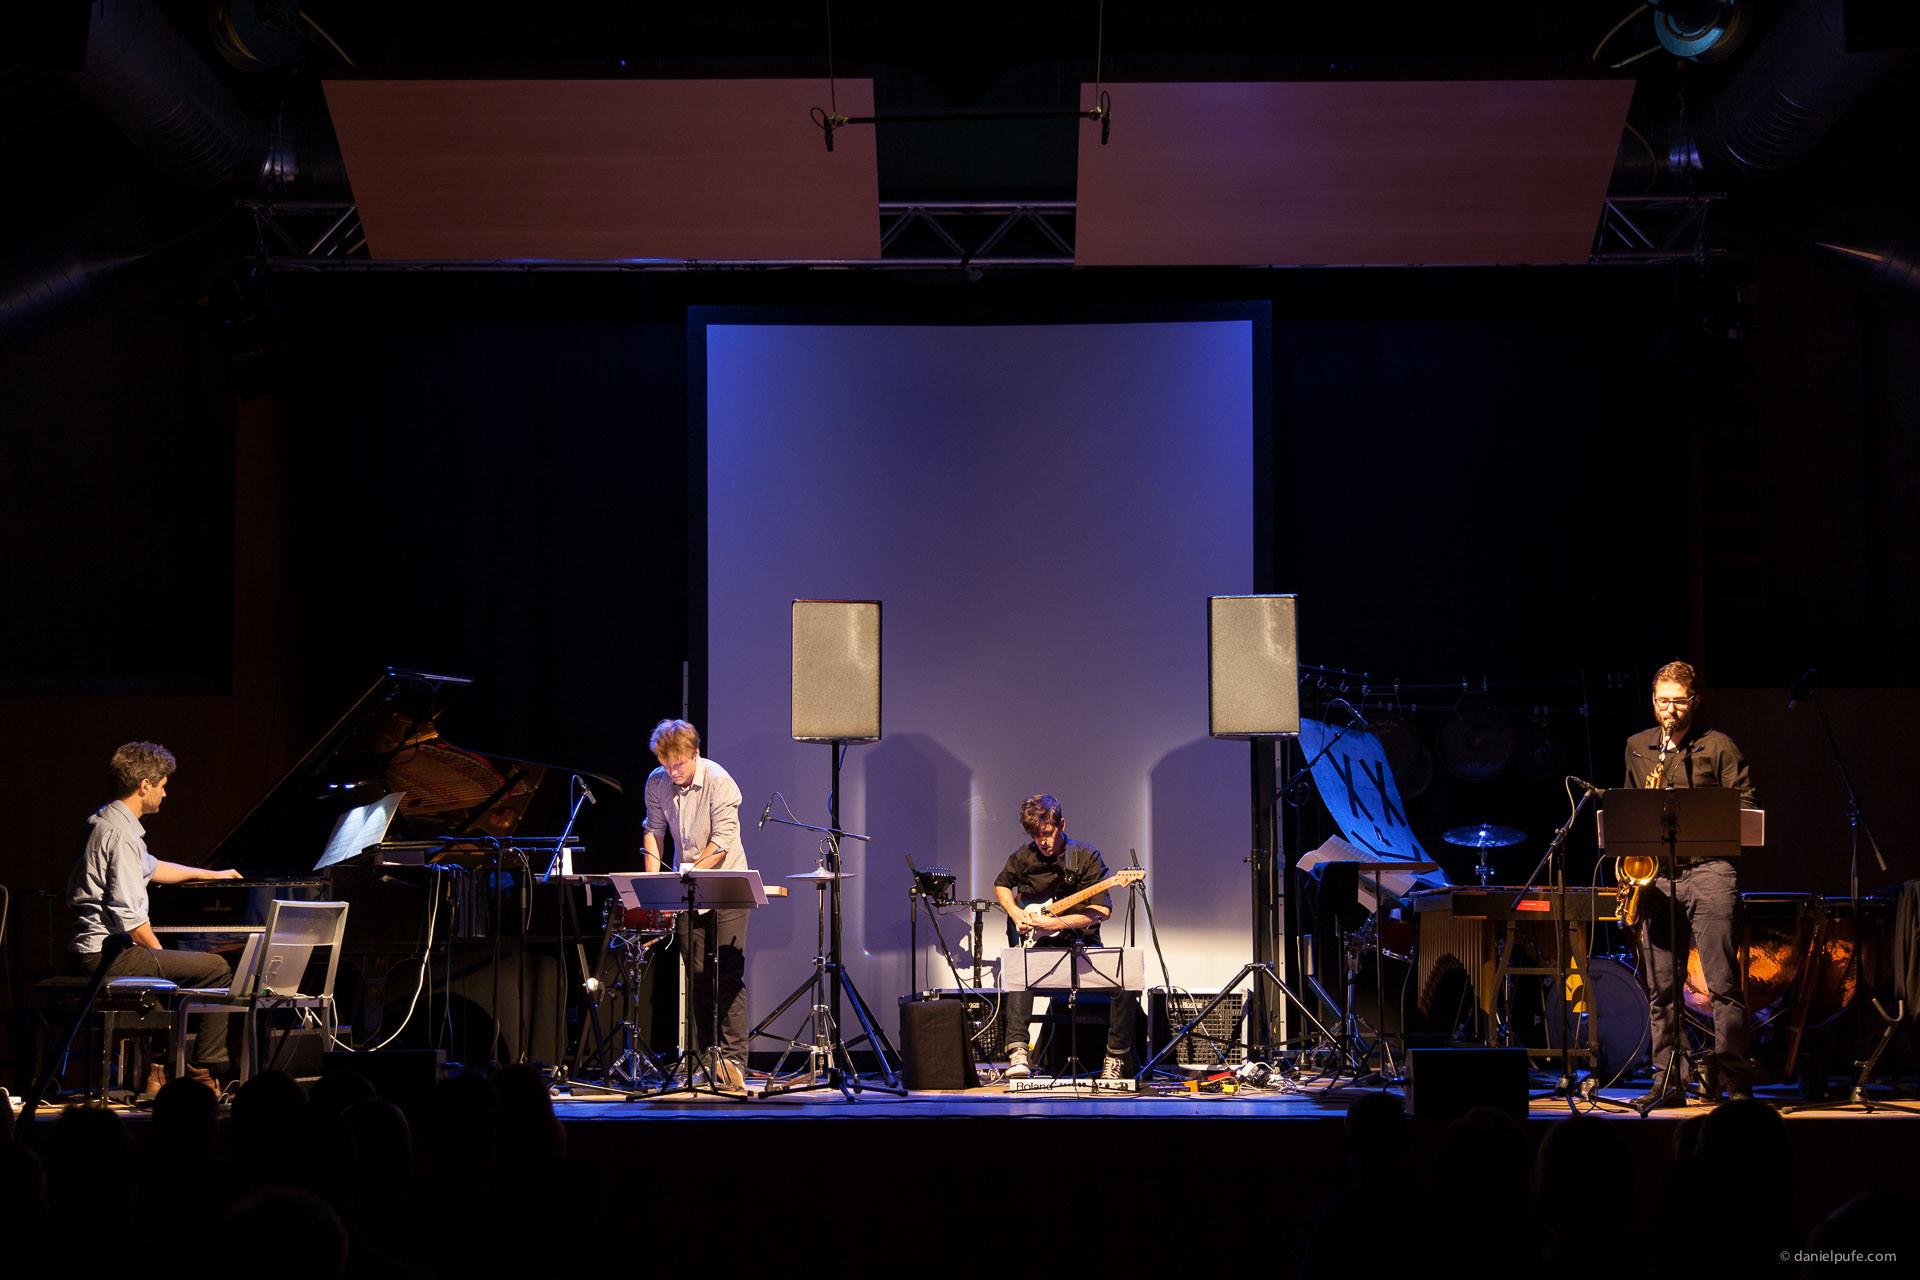 Concert: Ensemble Nikel - Centralstation